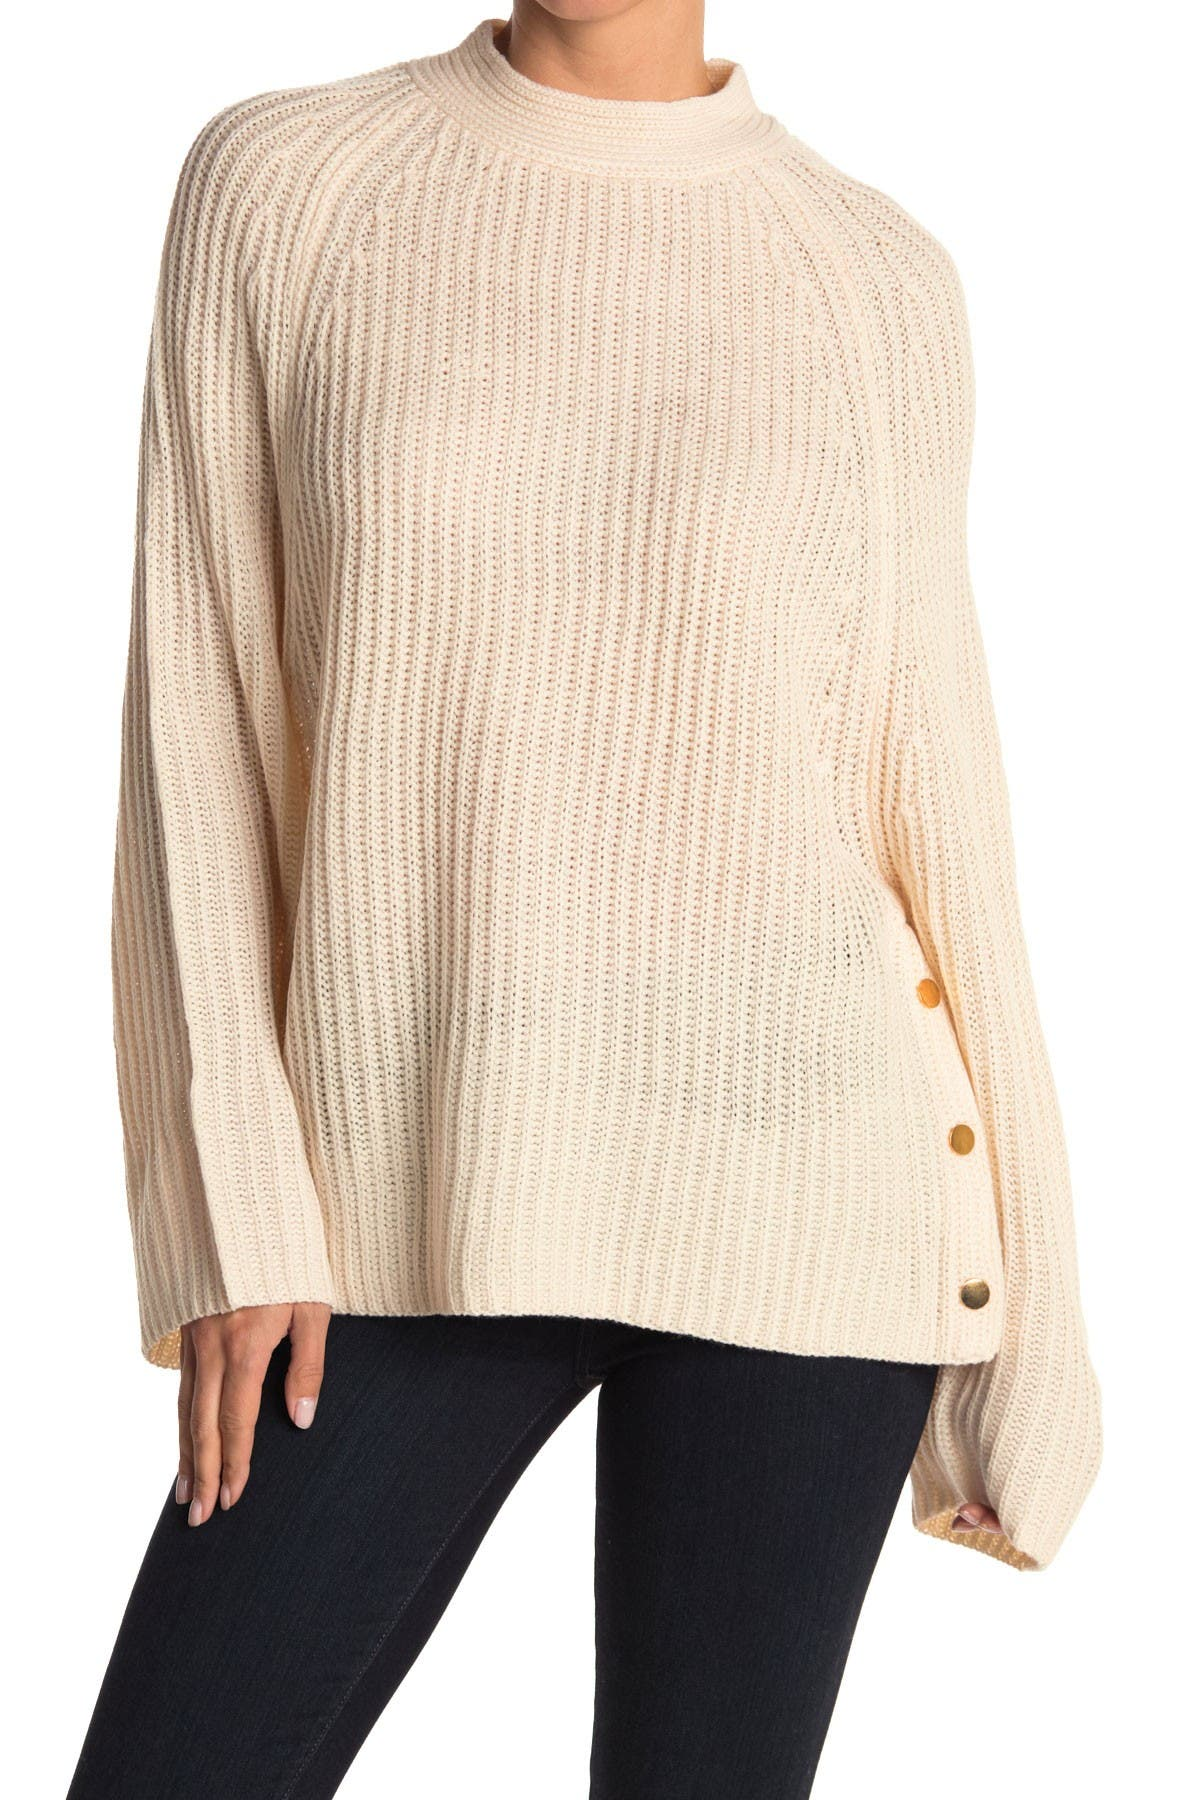 Image of HYFVE Mock Neck Oversized Sweater